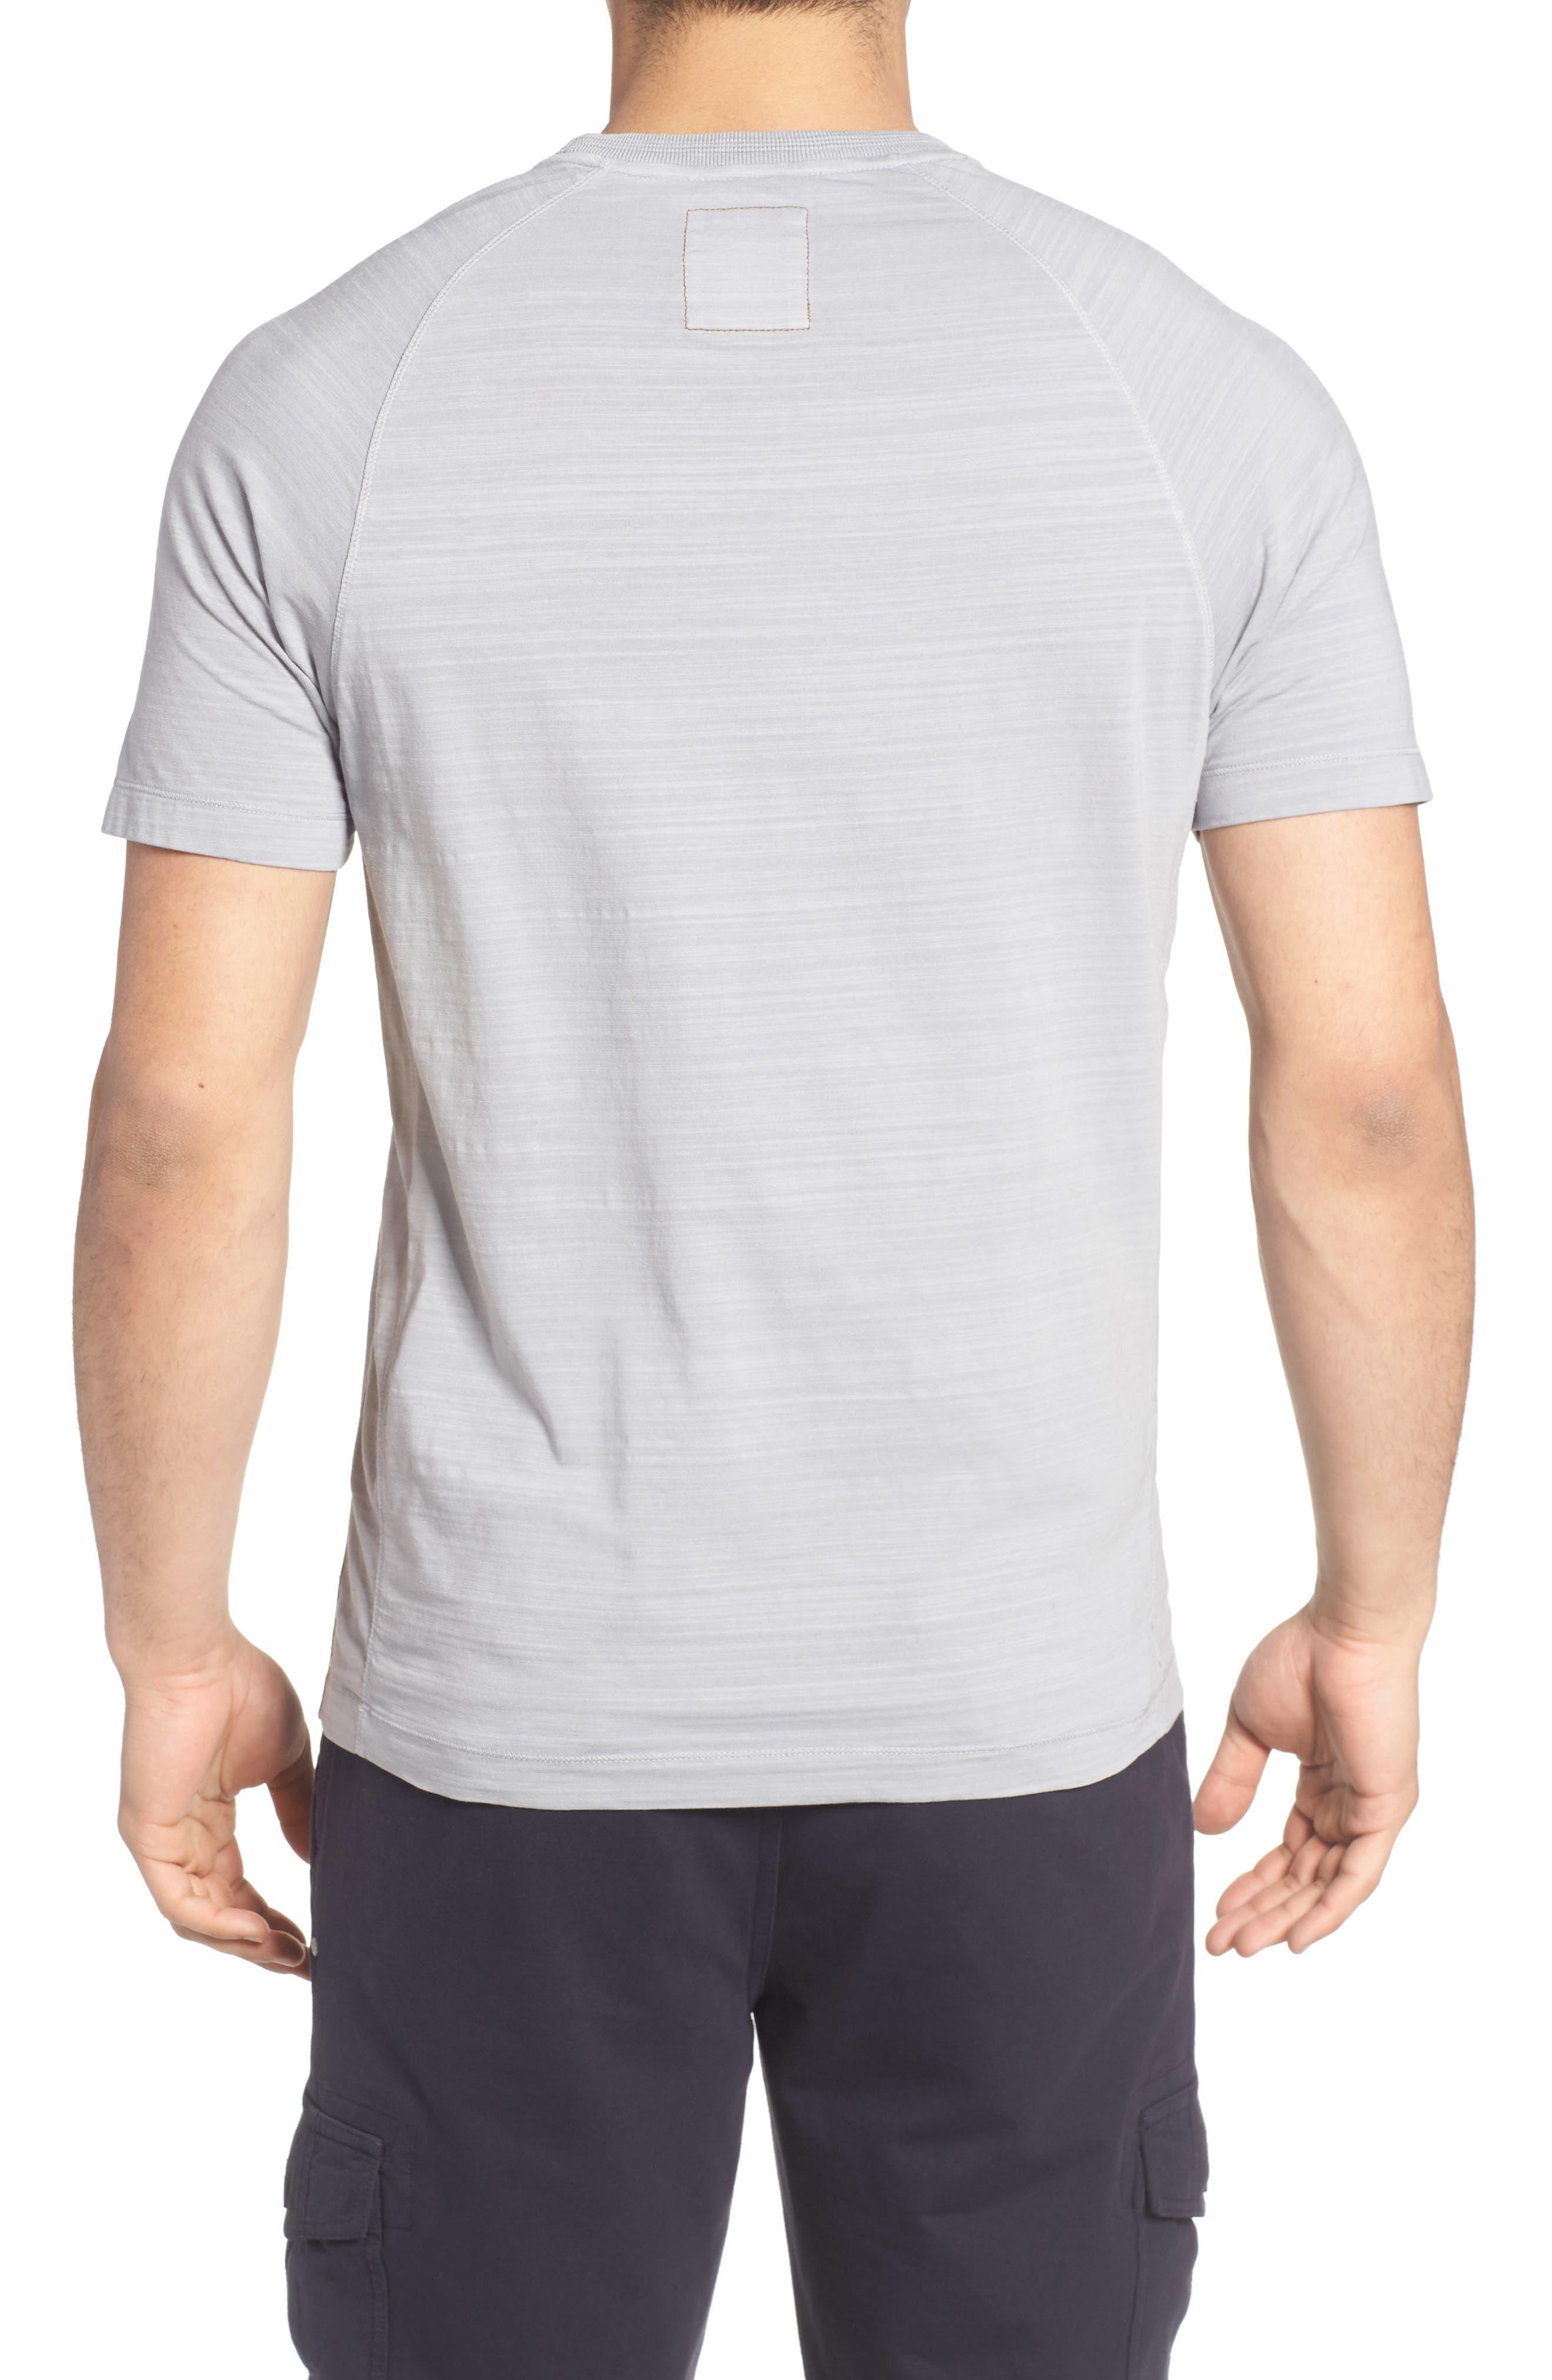 Alternate Image 2  - Thaddeus Riggs Stretch Slub Jersey T-Shirt